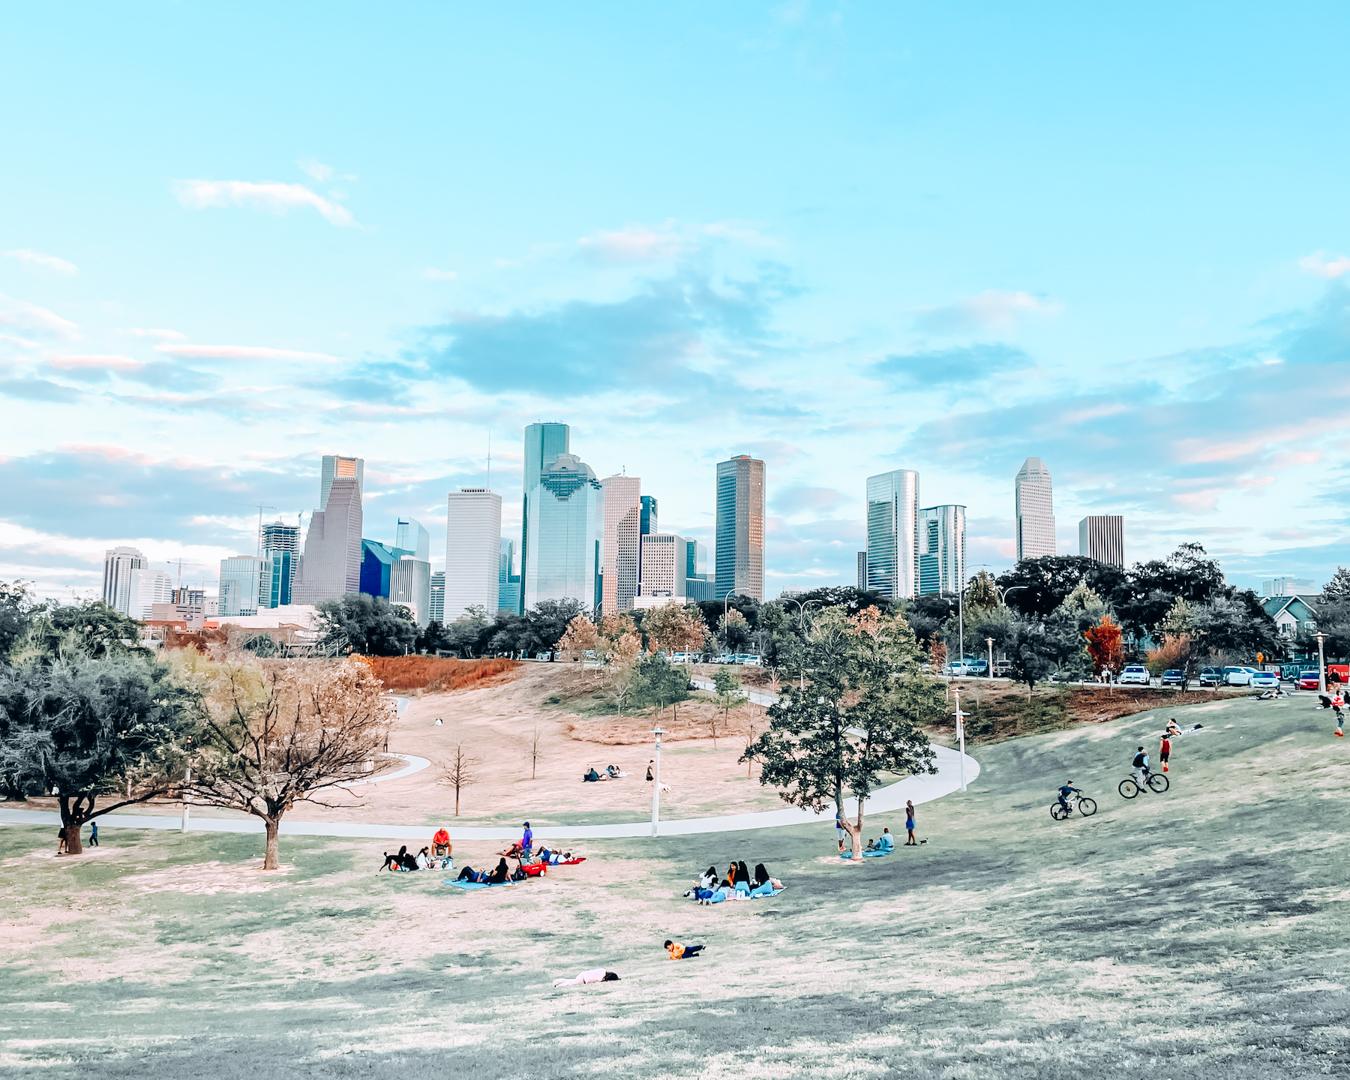 Park in Houston